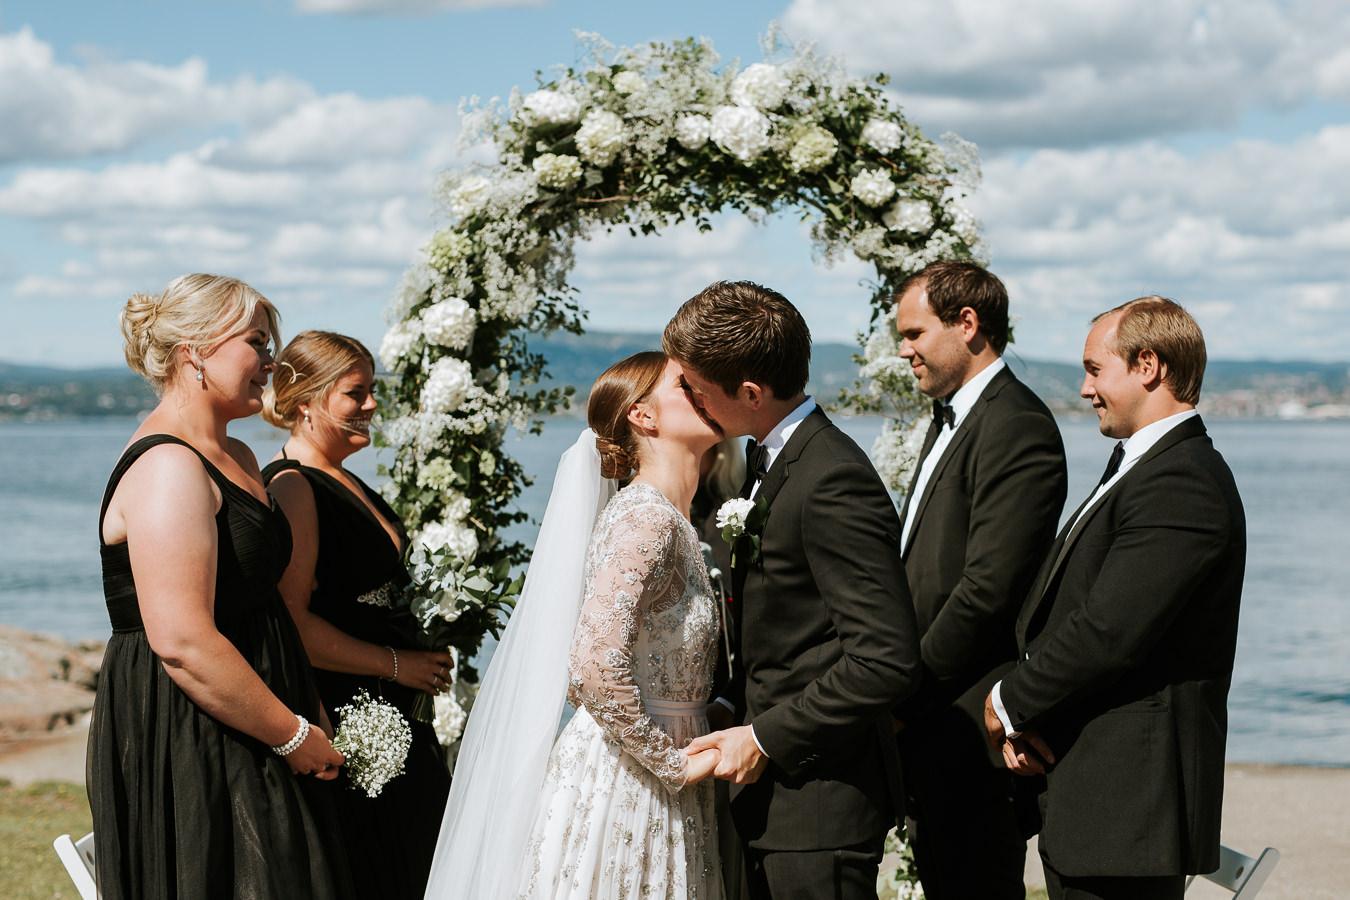 Bryllup-Hellviktangen-fotograf-tvedt-127.jpg